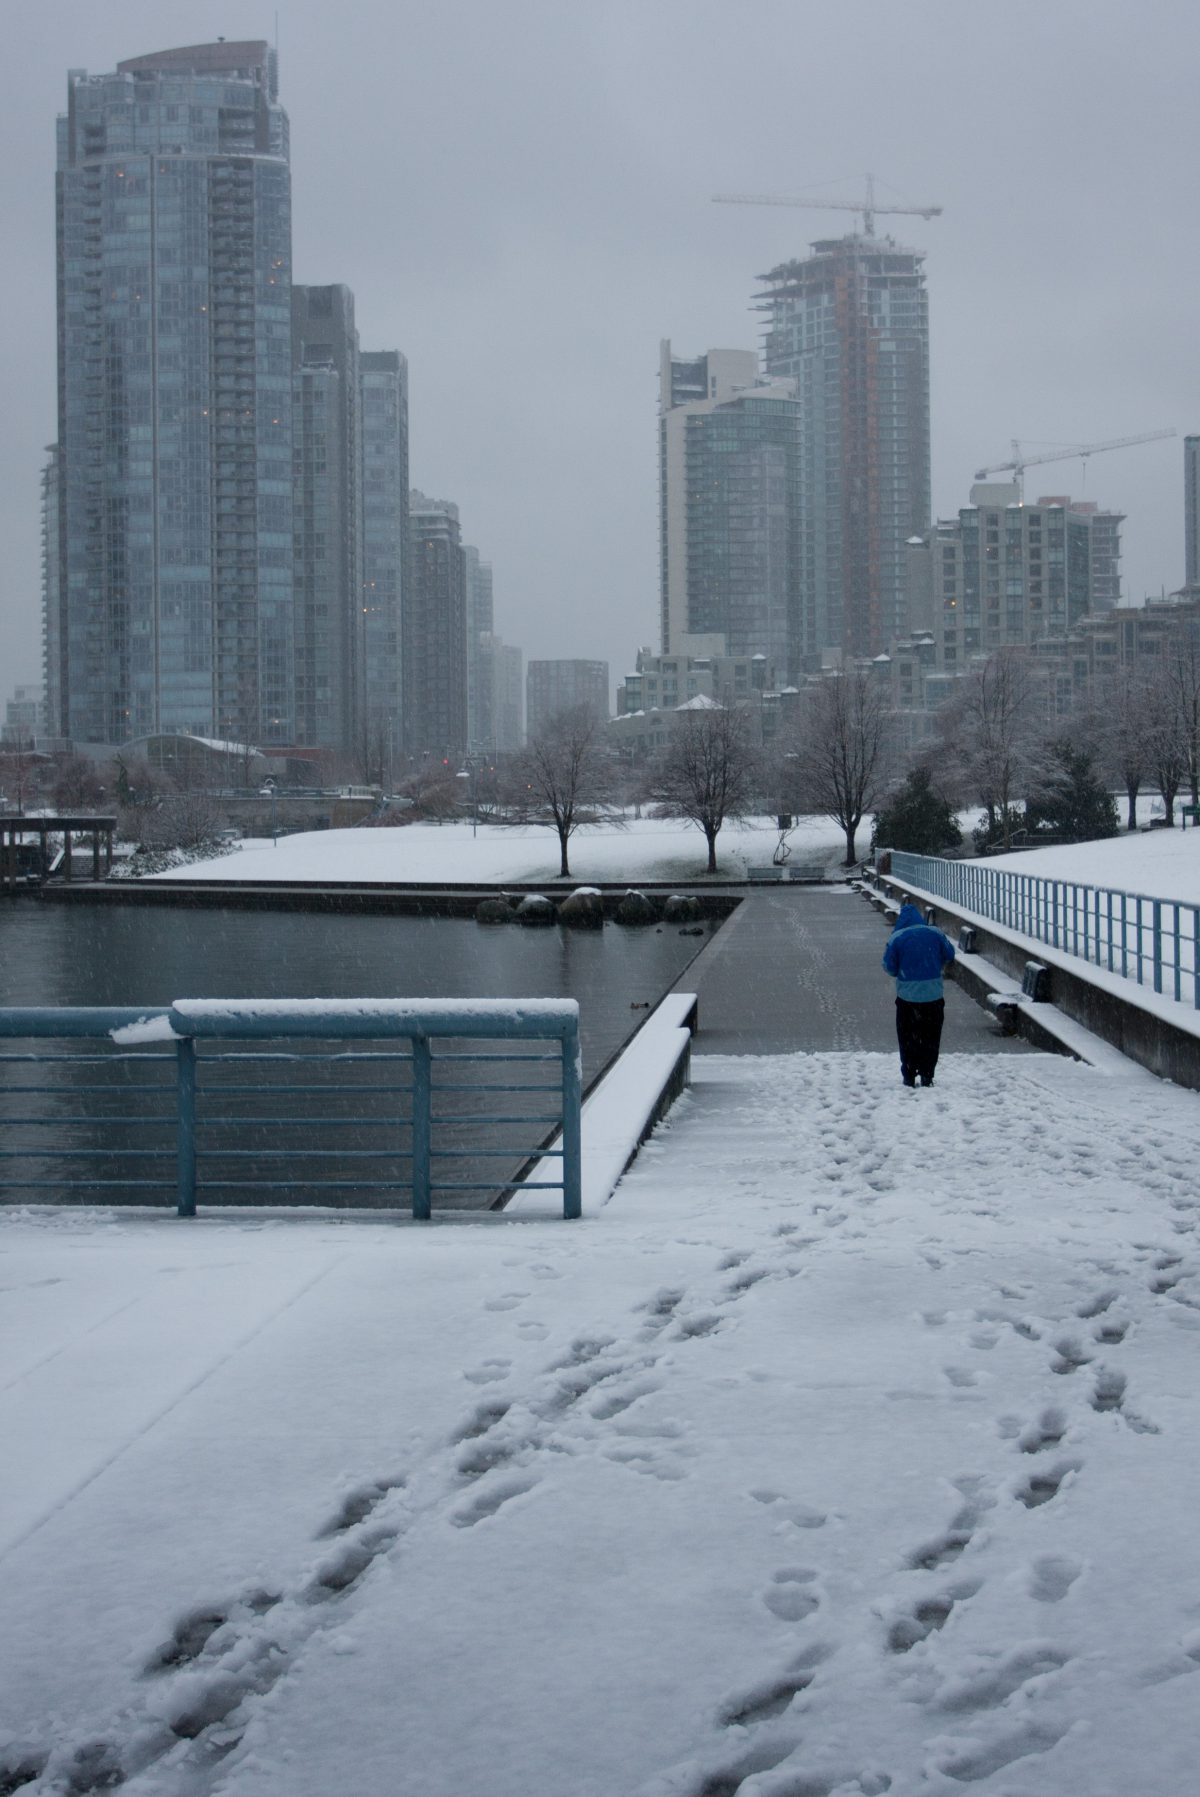 sea, snow, city